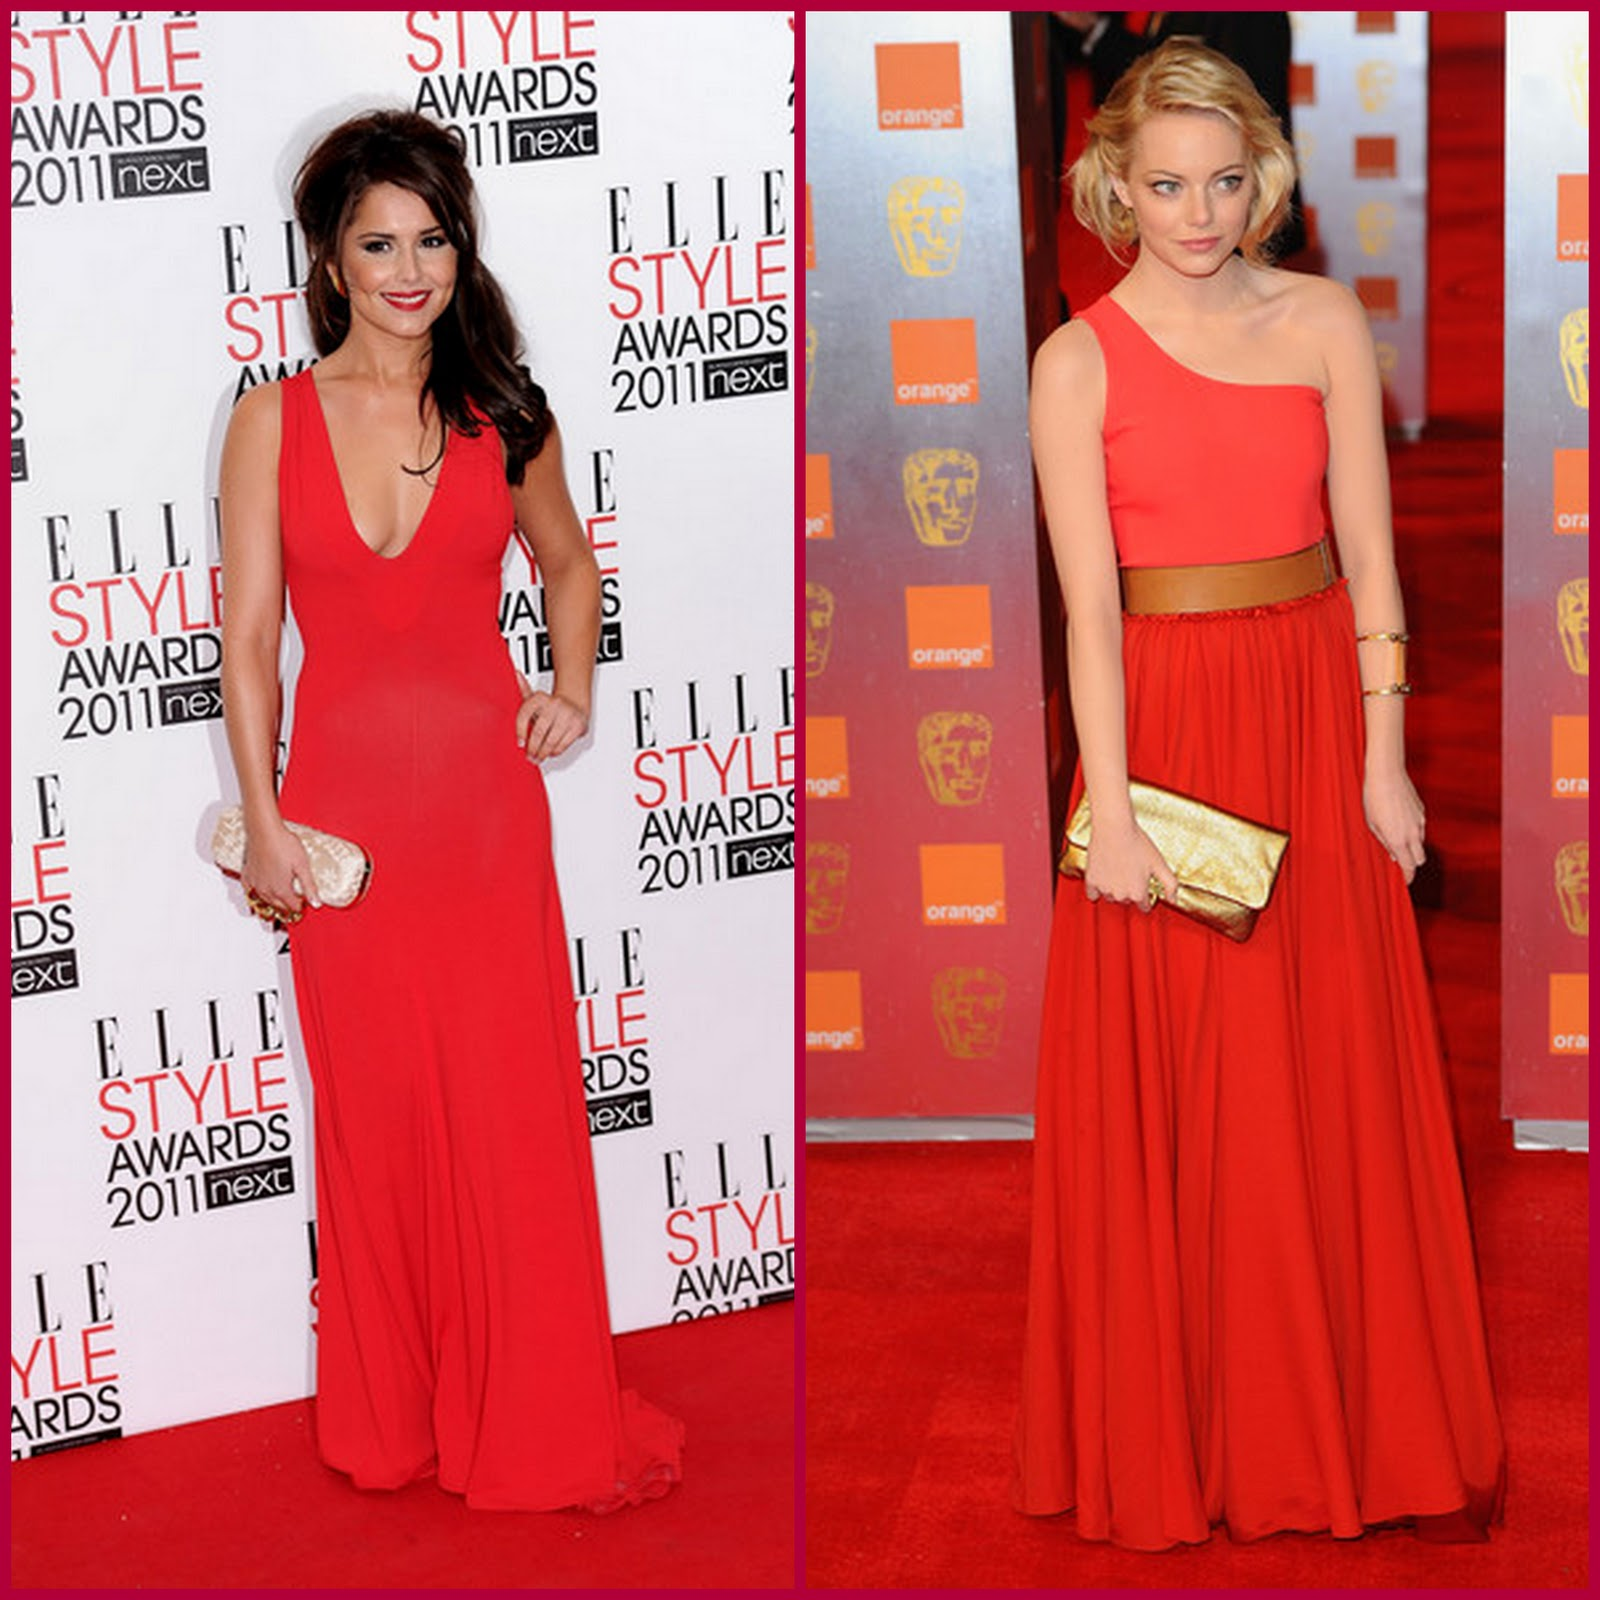 http://3.bp.blogspot.com/-hqH3BBtLfGc/TVxdY-ftWKI/AAAAAAAAAPw/nPDbLm7_lSc/s1600/Ladies+in+Red.jpg